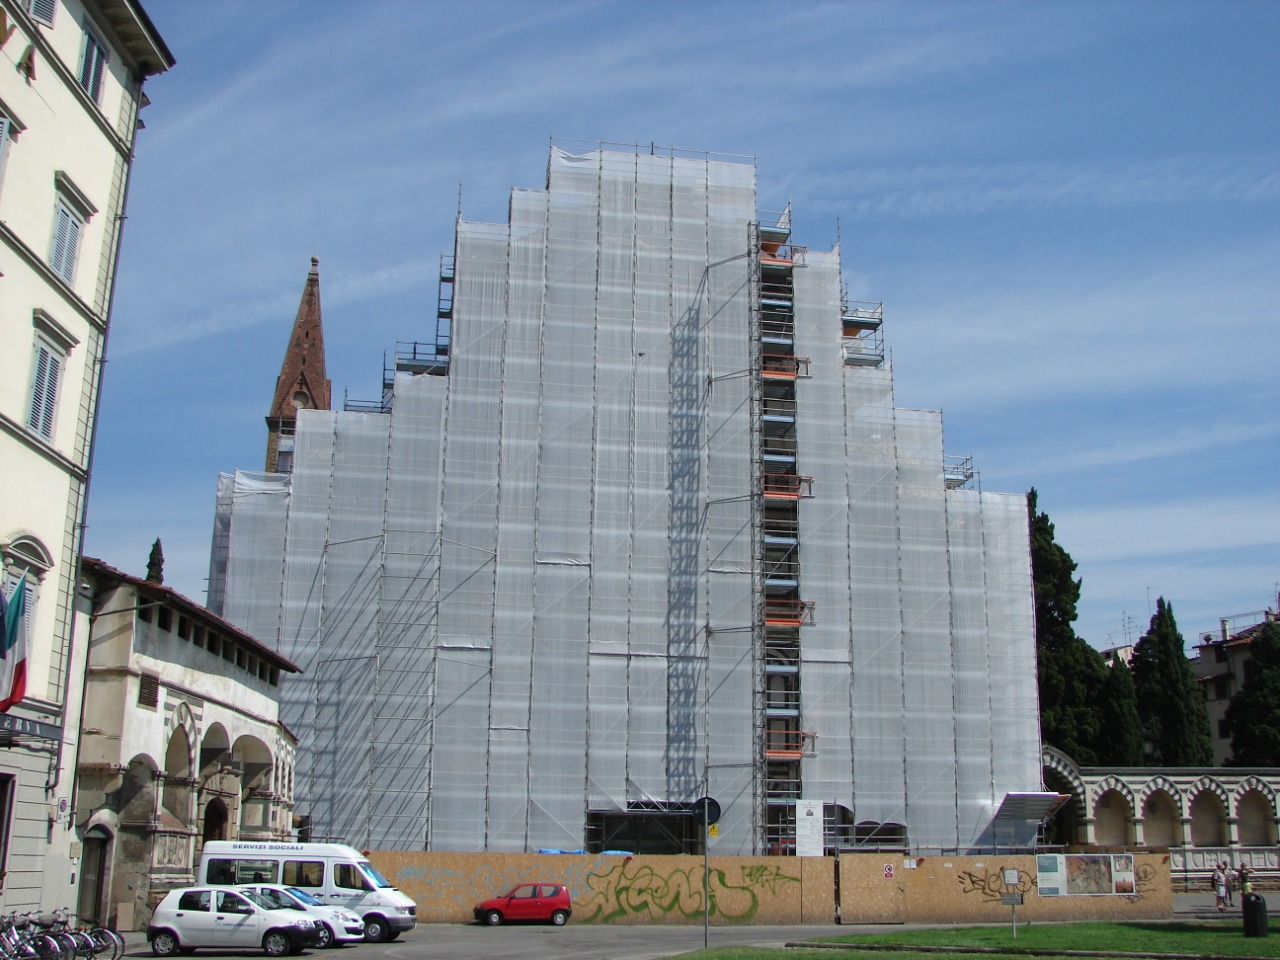 Gallery foto n.1 Multiceta - restauro Basilica di S.M. Novella